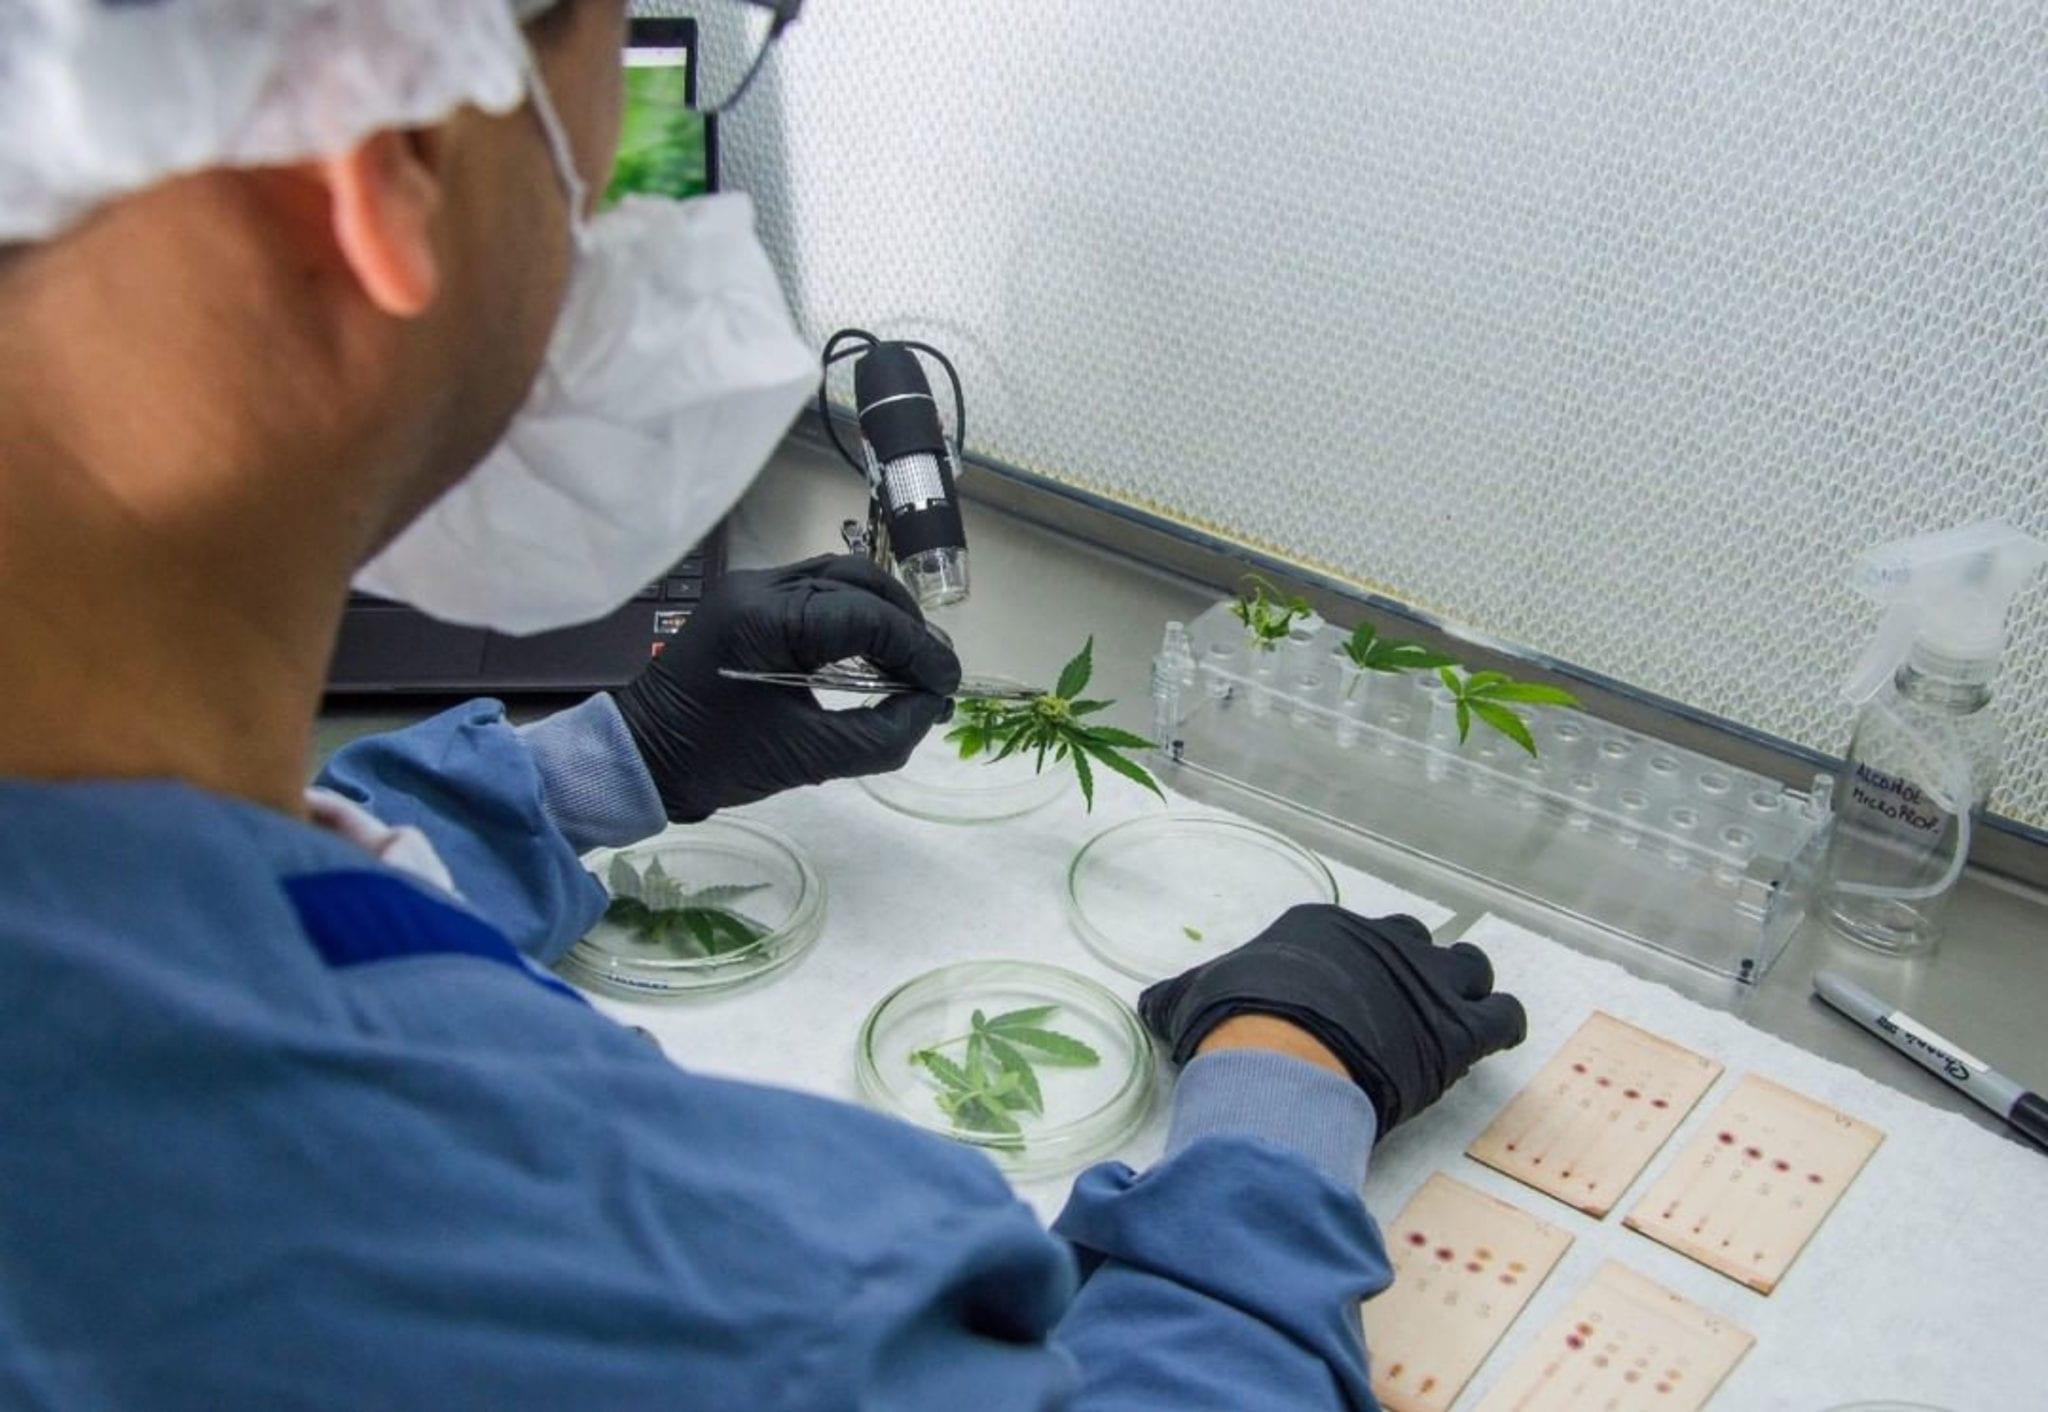 Ikänik Farms makes first pharma-grade cannabis oil sale in Colombia